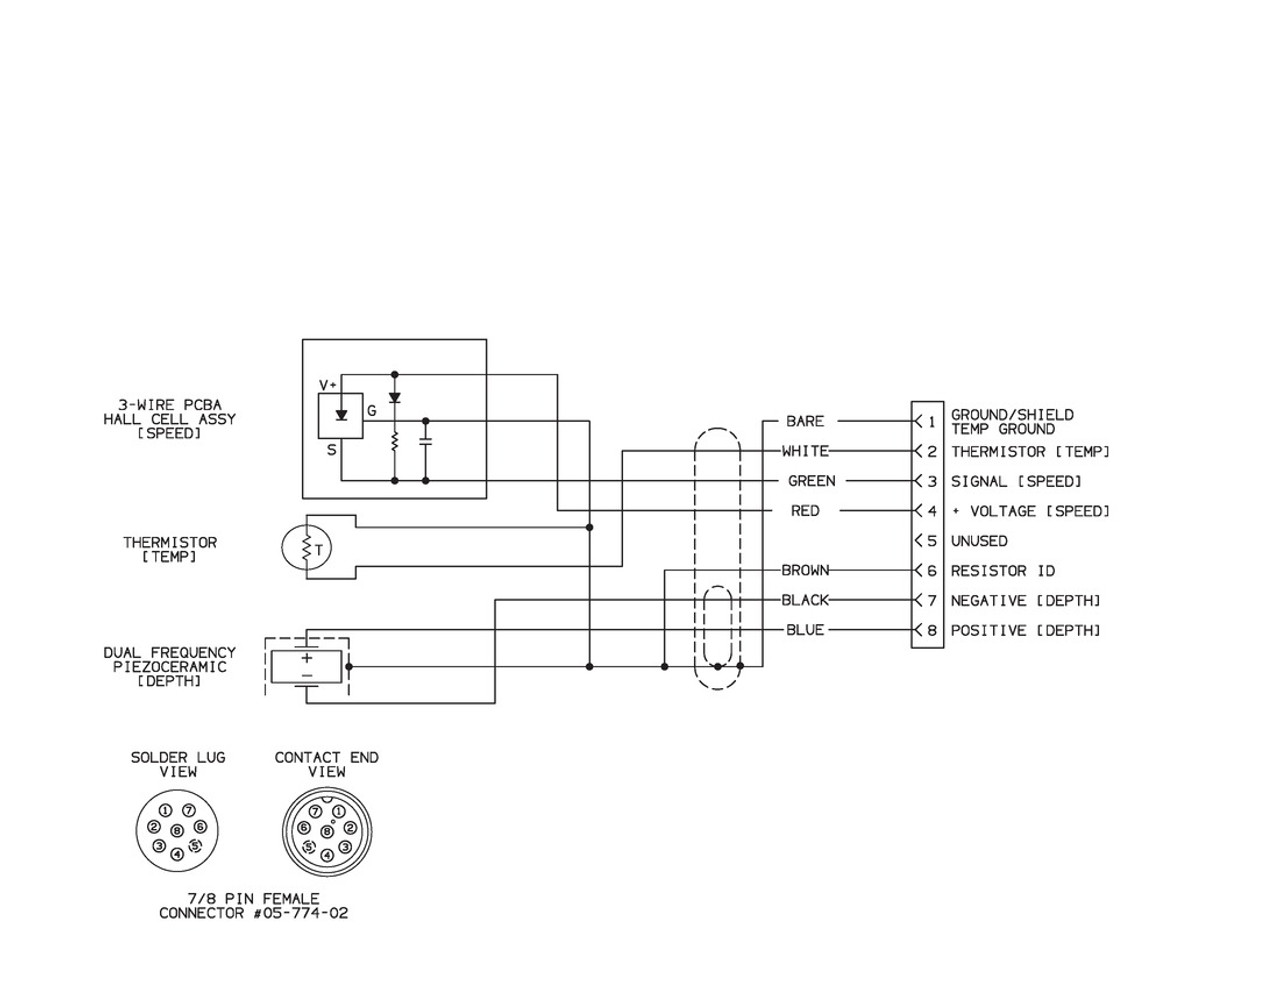 small resolution of airmar wiring diagram garmin p66 600w s d t blue bottle marine